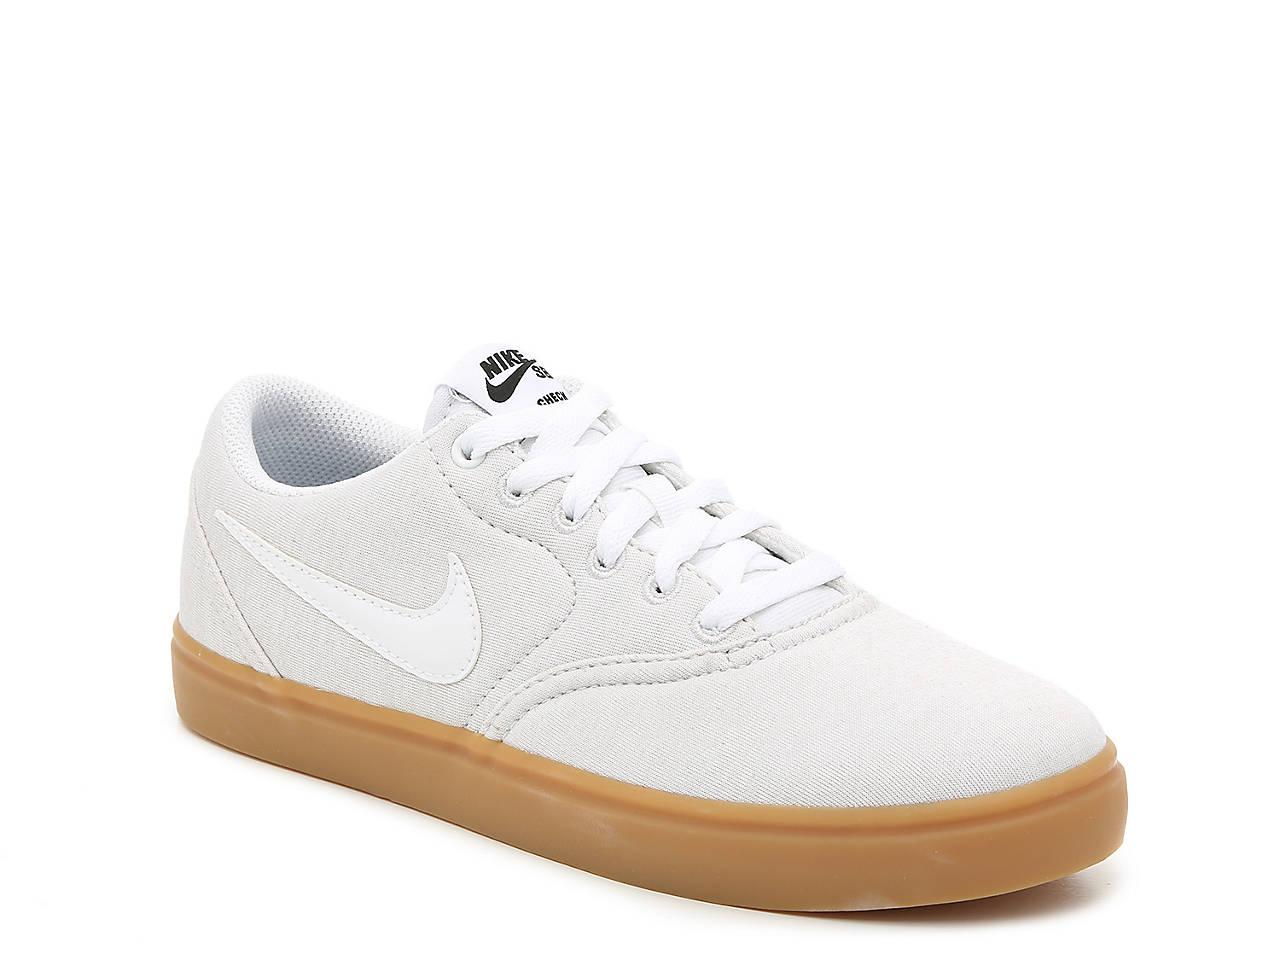 6b81e908c Nike SB Check Solar Sneaker - Women s Women s Shoes